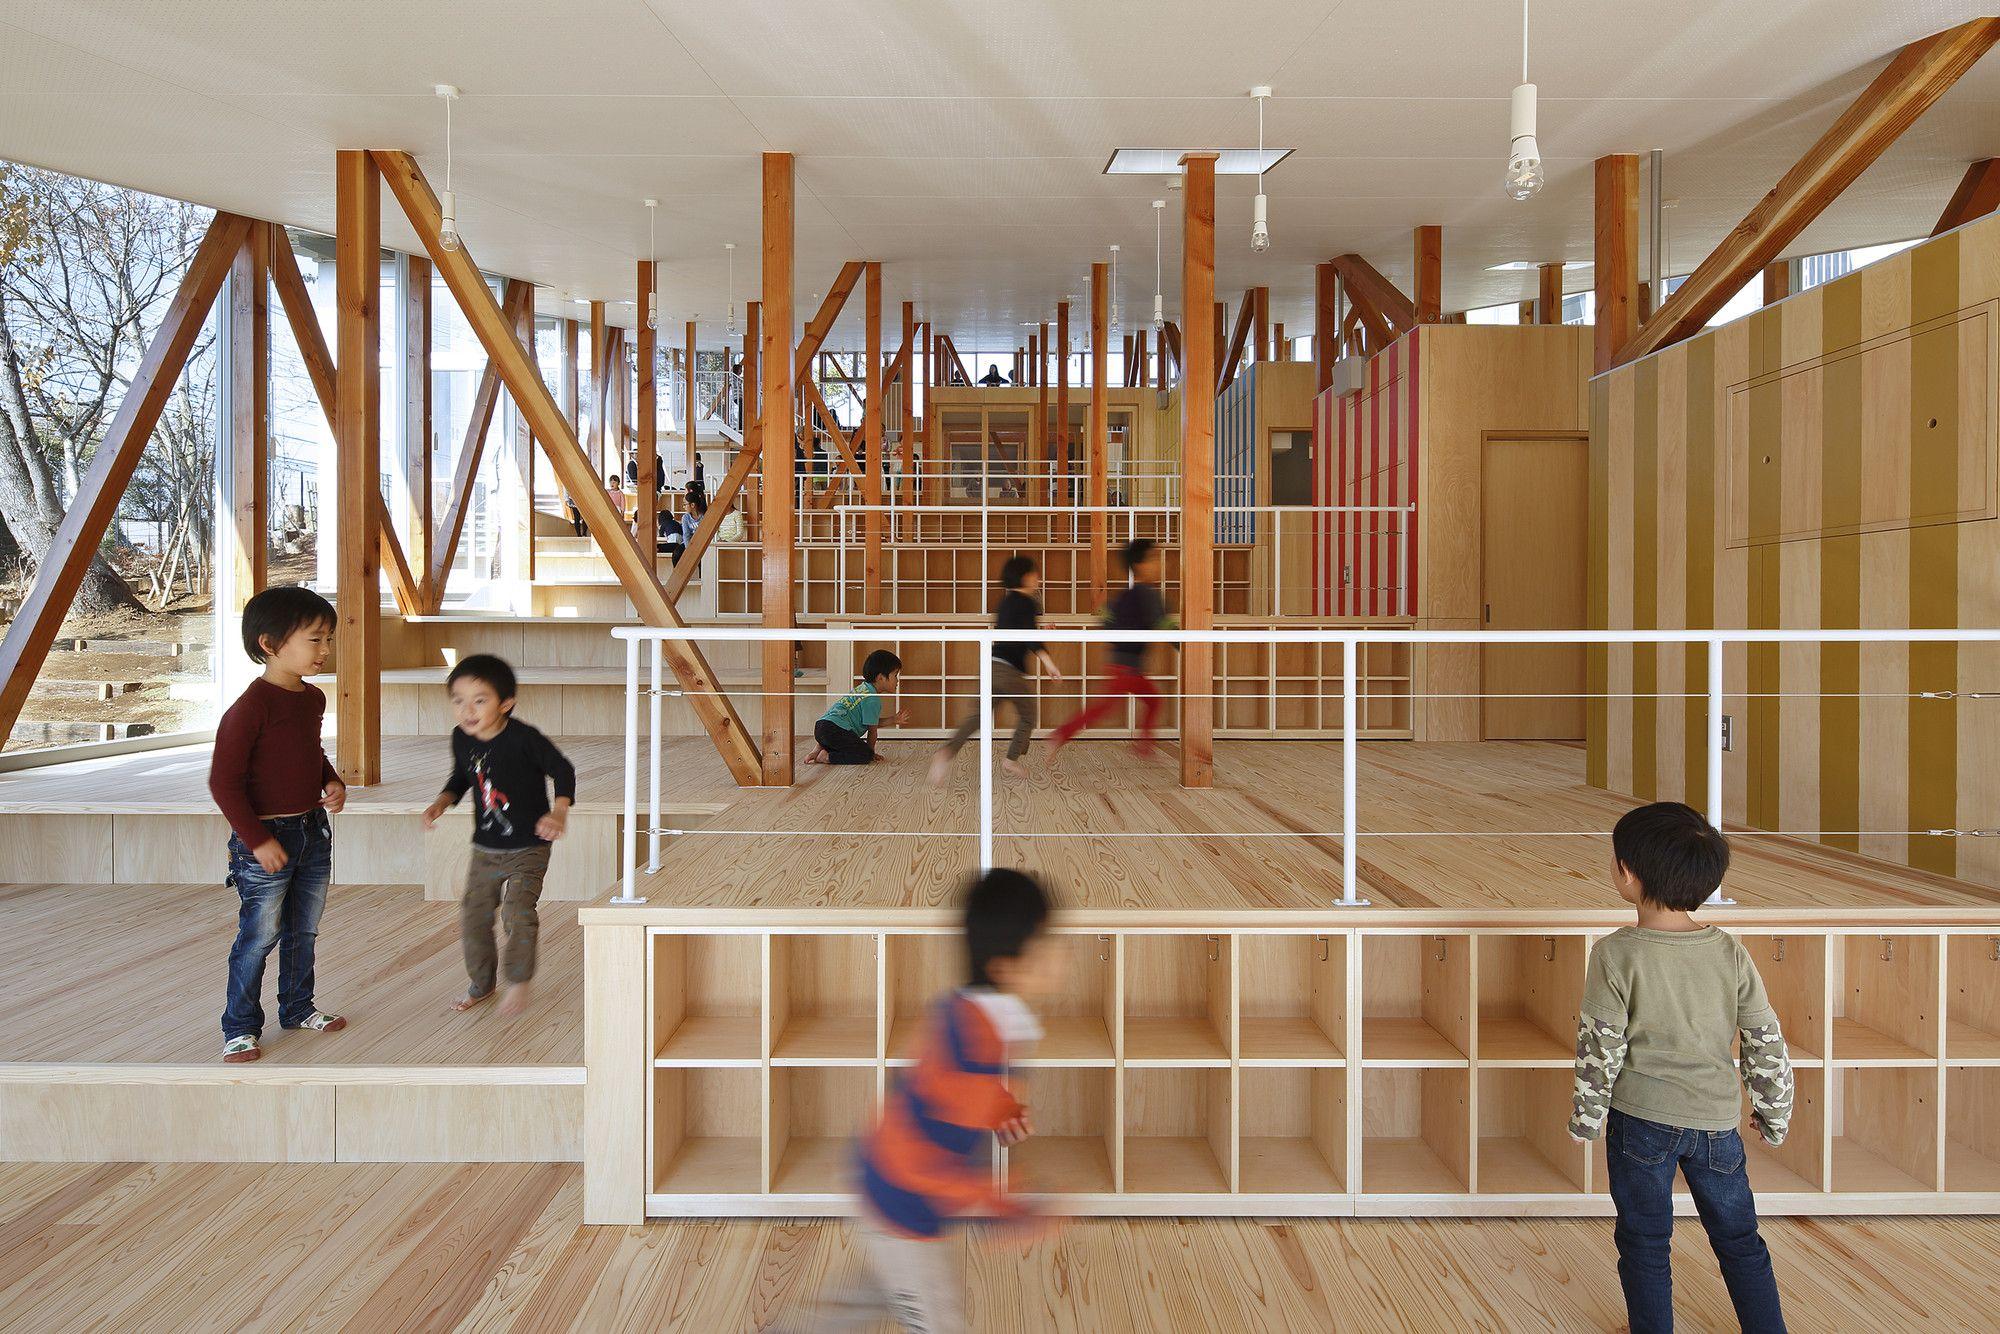 Built By Yamazaki Kentaro Design Work In Chiba An This Nursery School Sakura